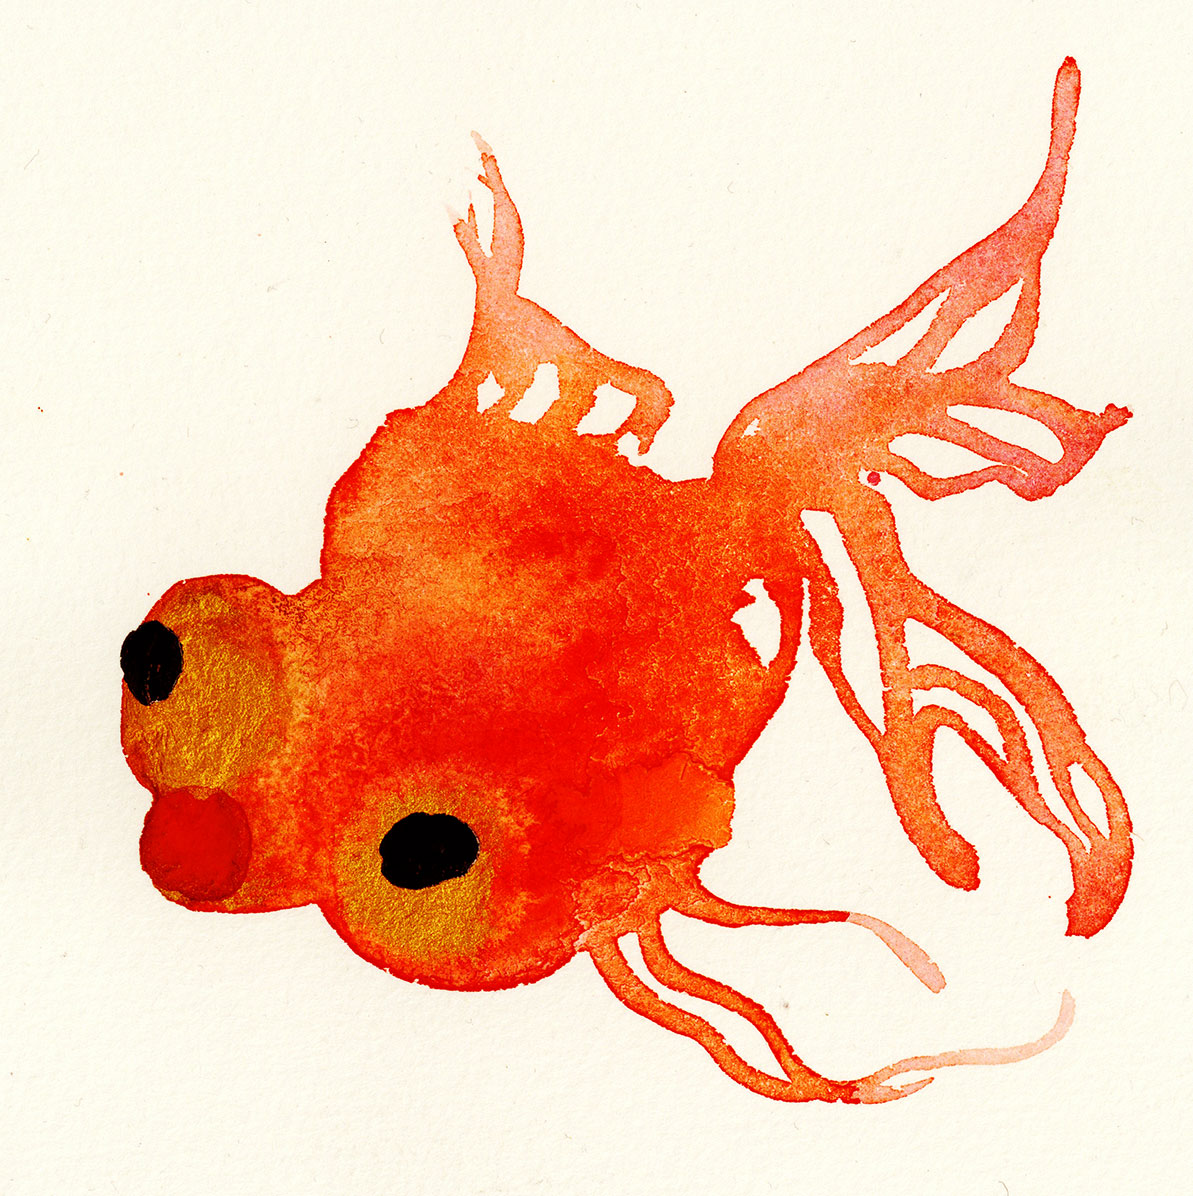 goldfish8.jpg